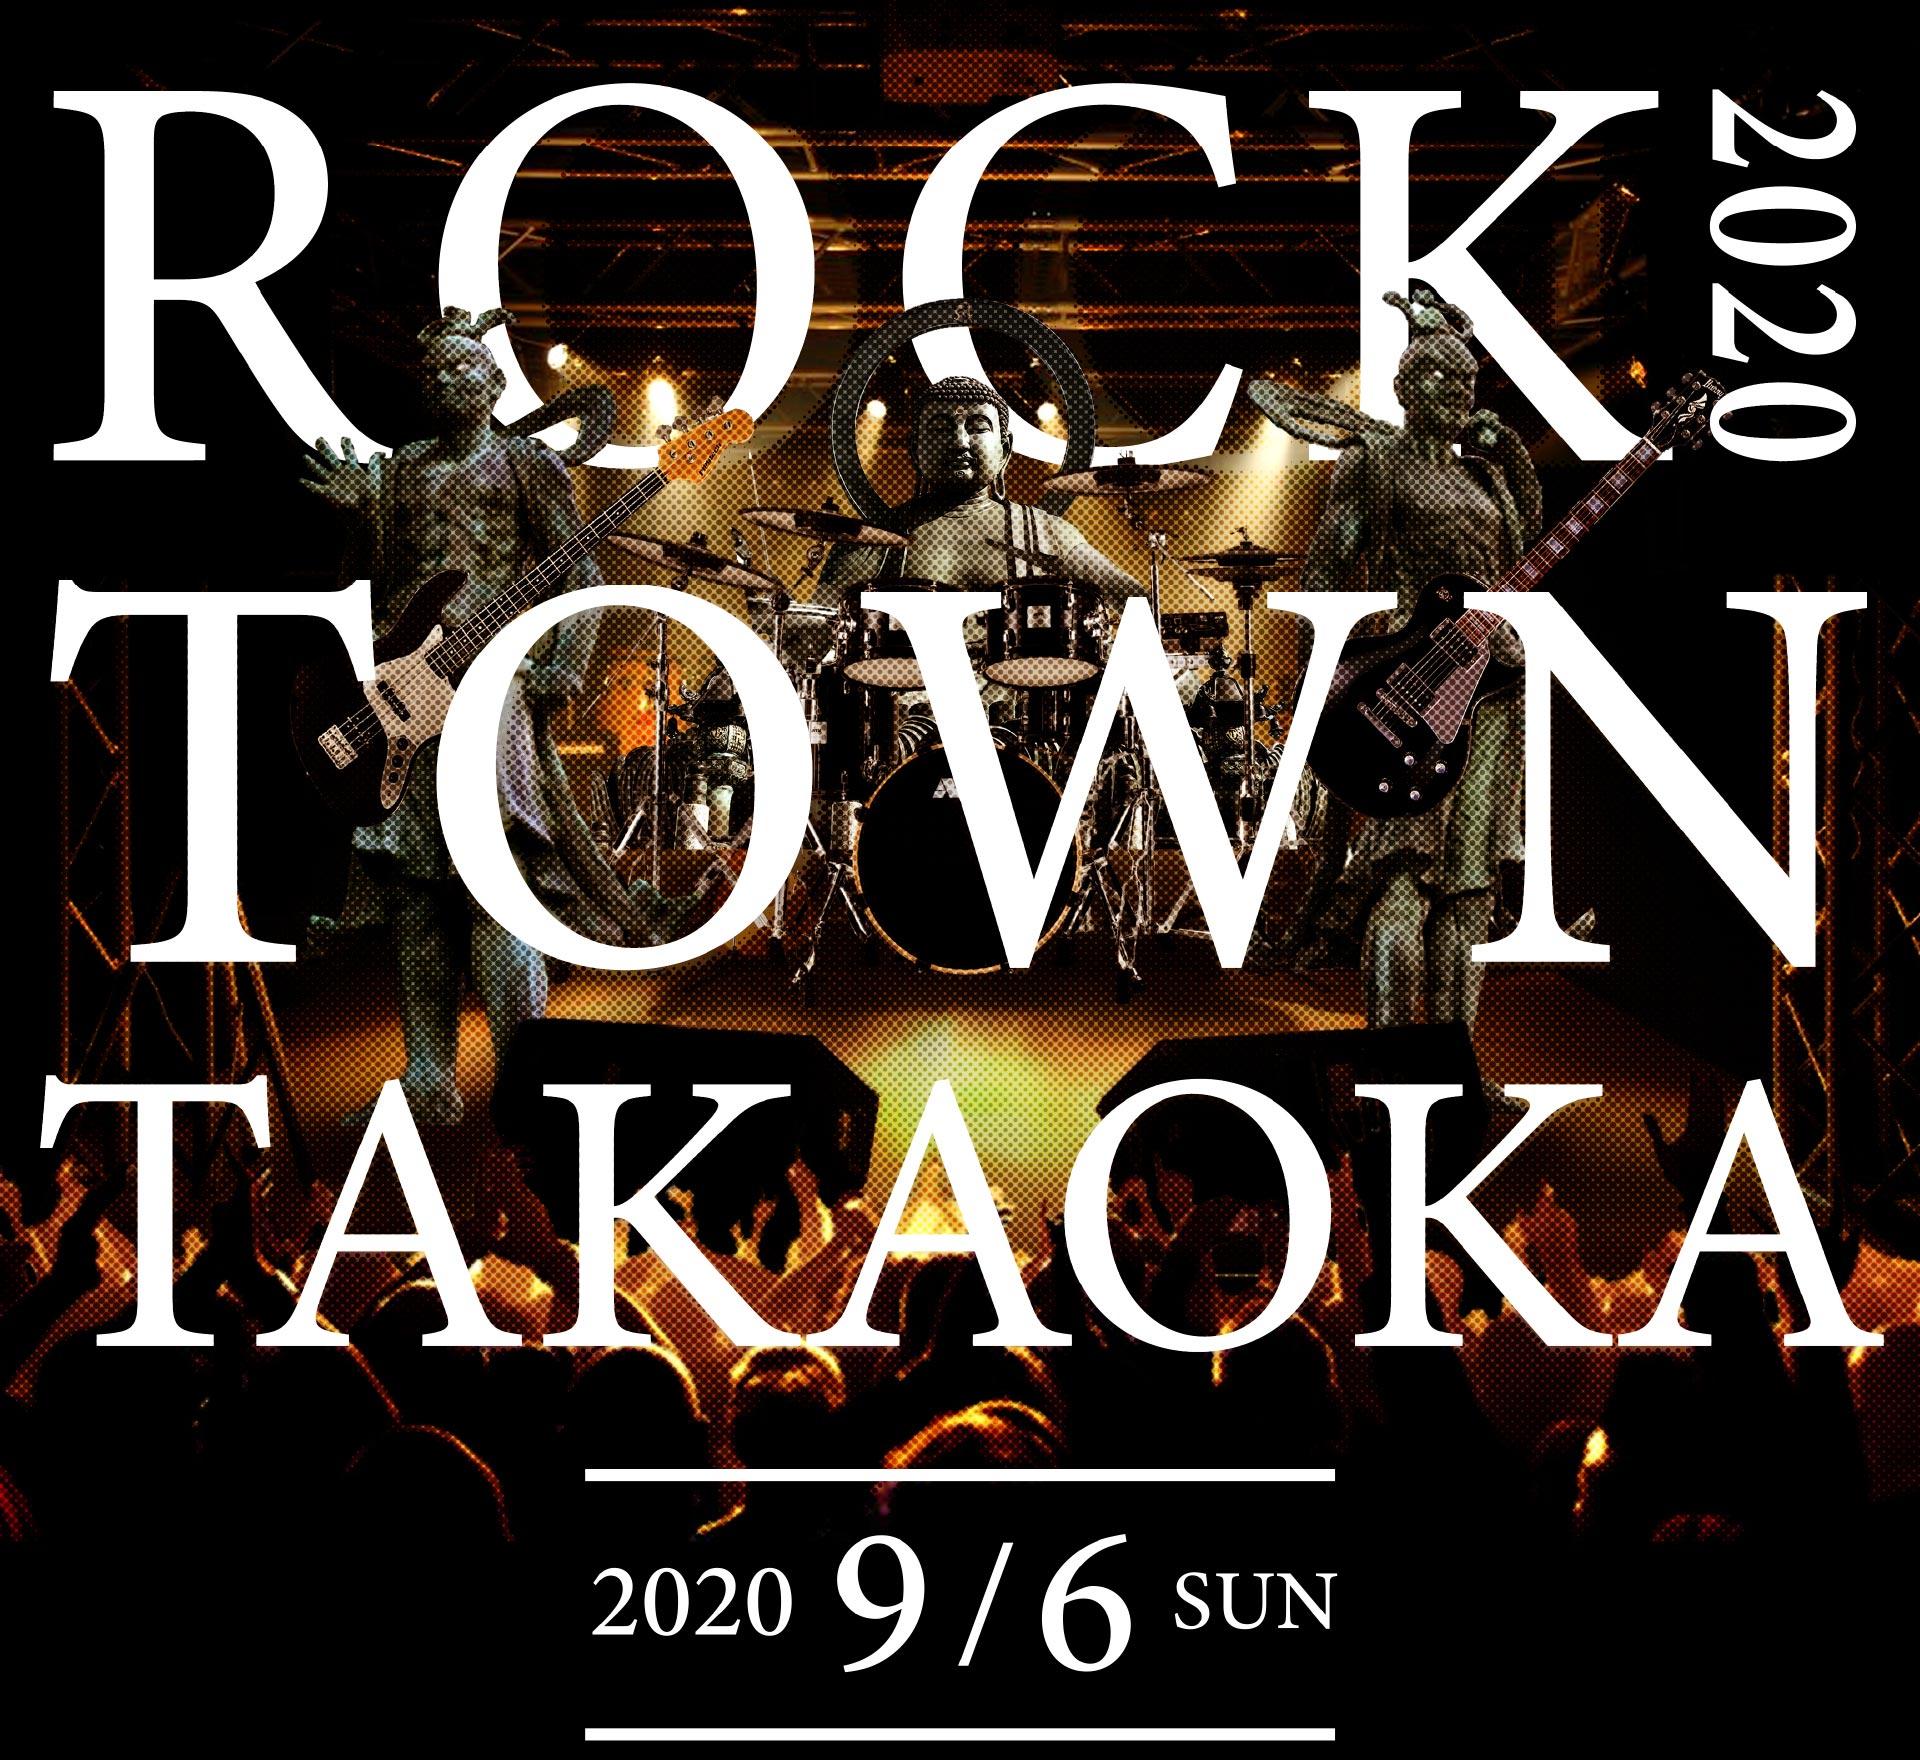 ROCK TOWN TAKAOKA 2020 富山県高岡市のロックライブフェスティバルはロックタウン高岡